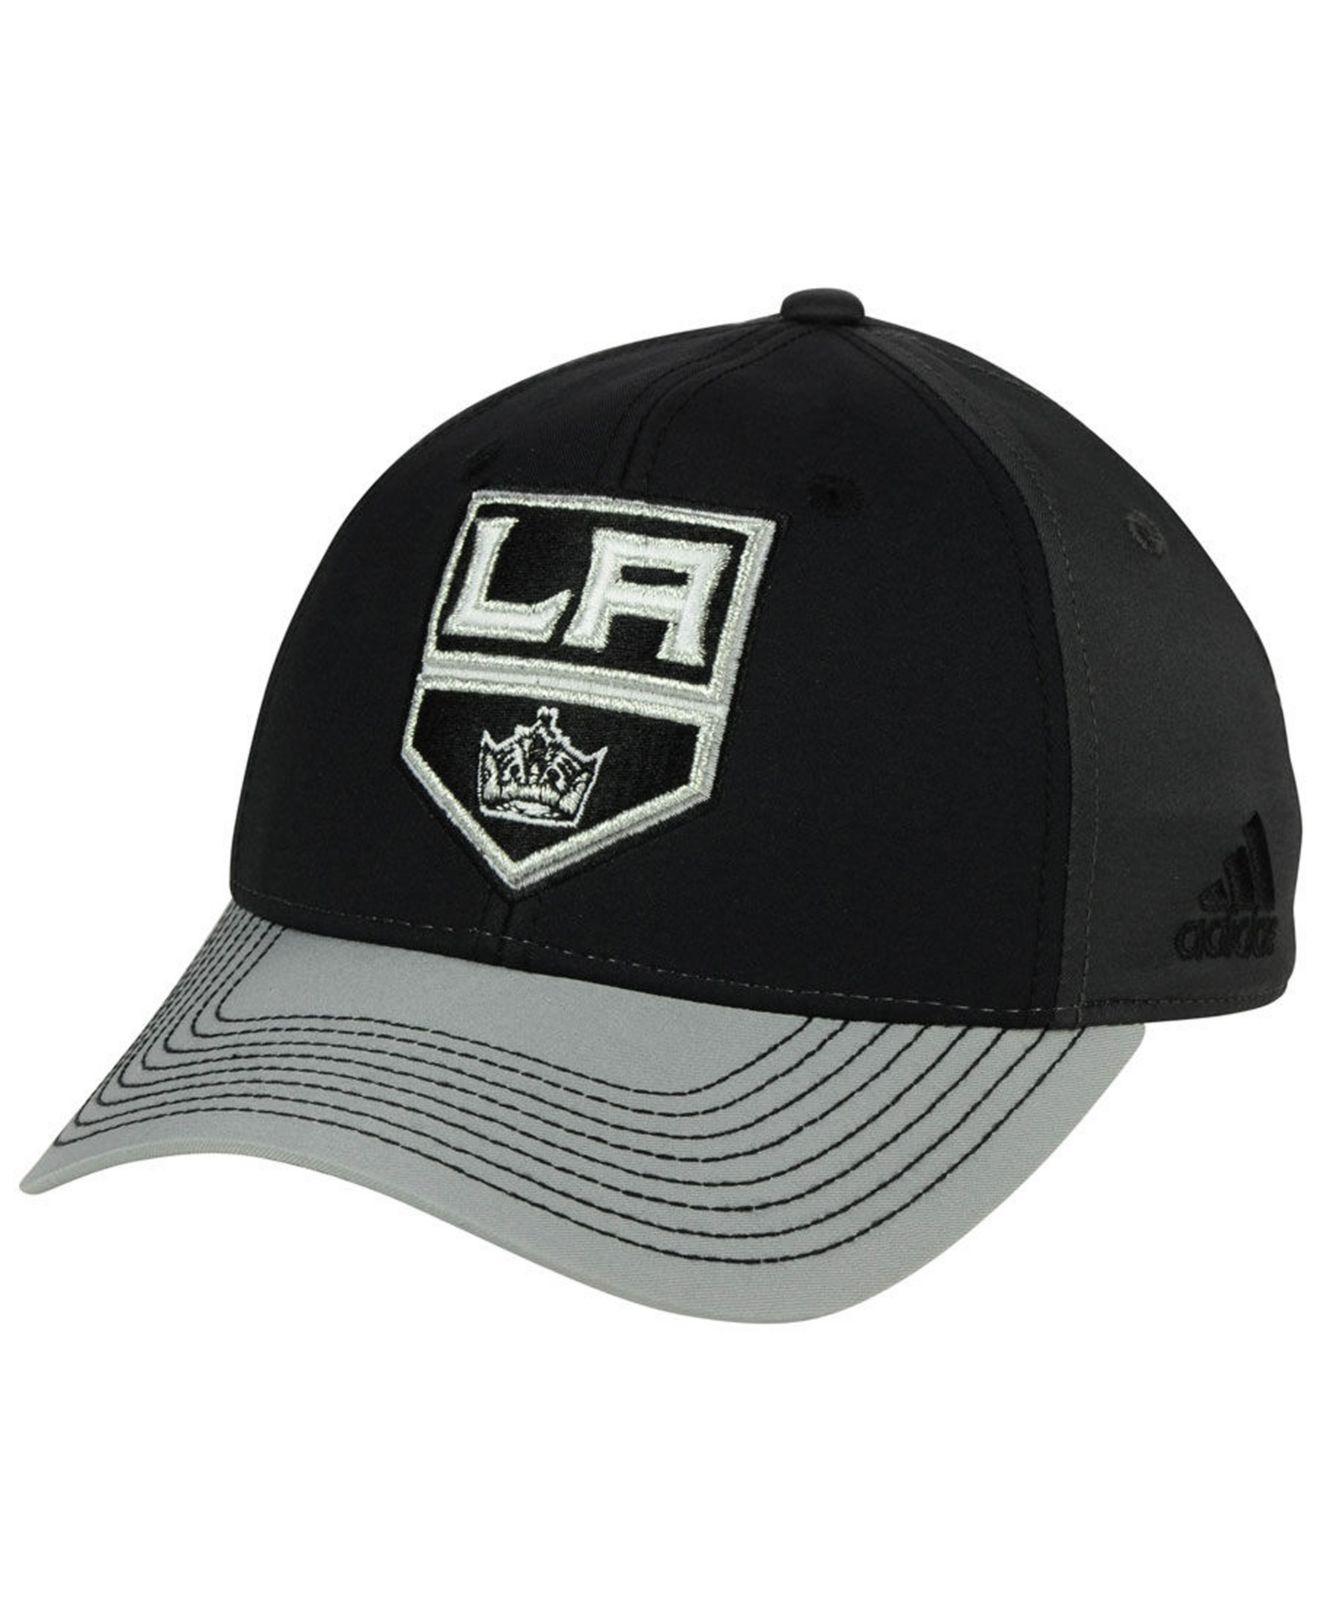 size 40 3dab2 d2694 adidas. Men s Black Los Angeles Kings 2tone Stitch Flex Cap